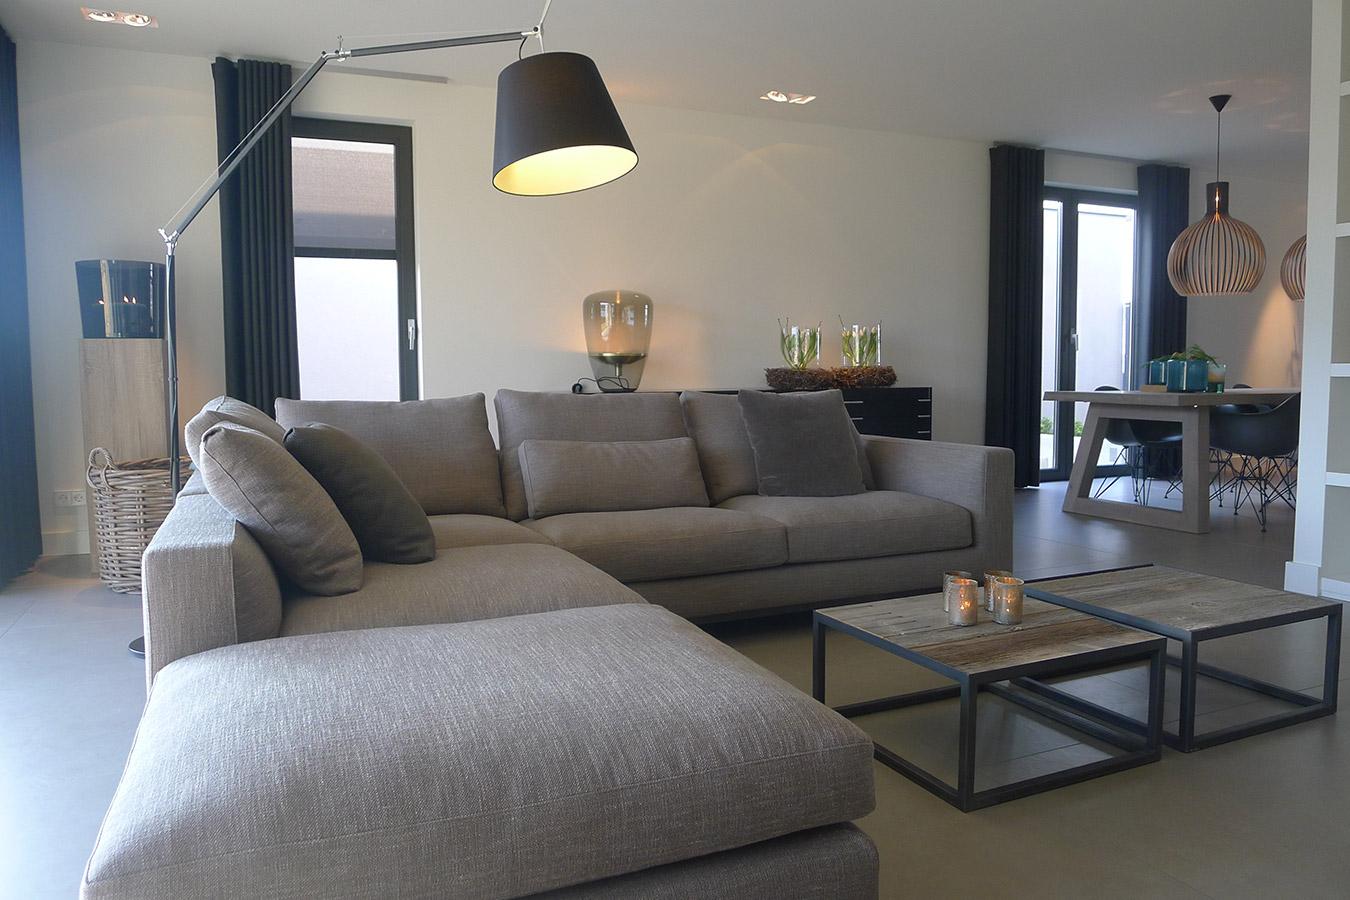 Interieur ontwerp Nieuwbouw| Interieurarchitectuur | Ontwerpbureau ...